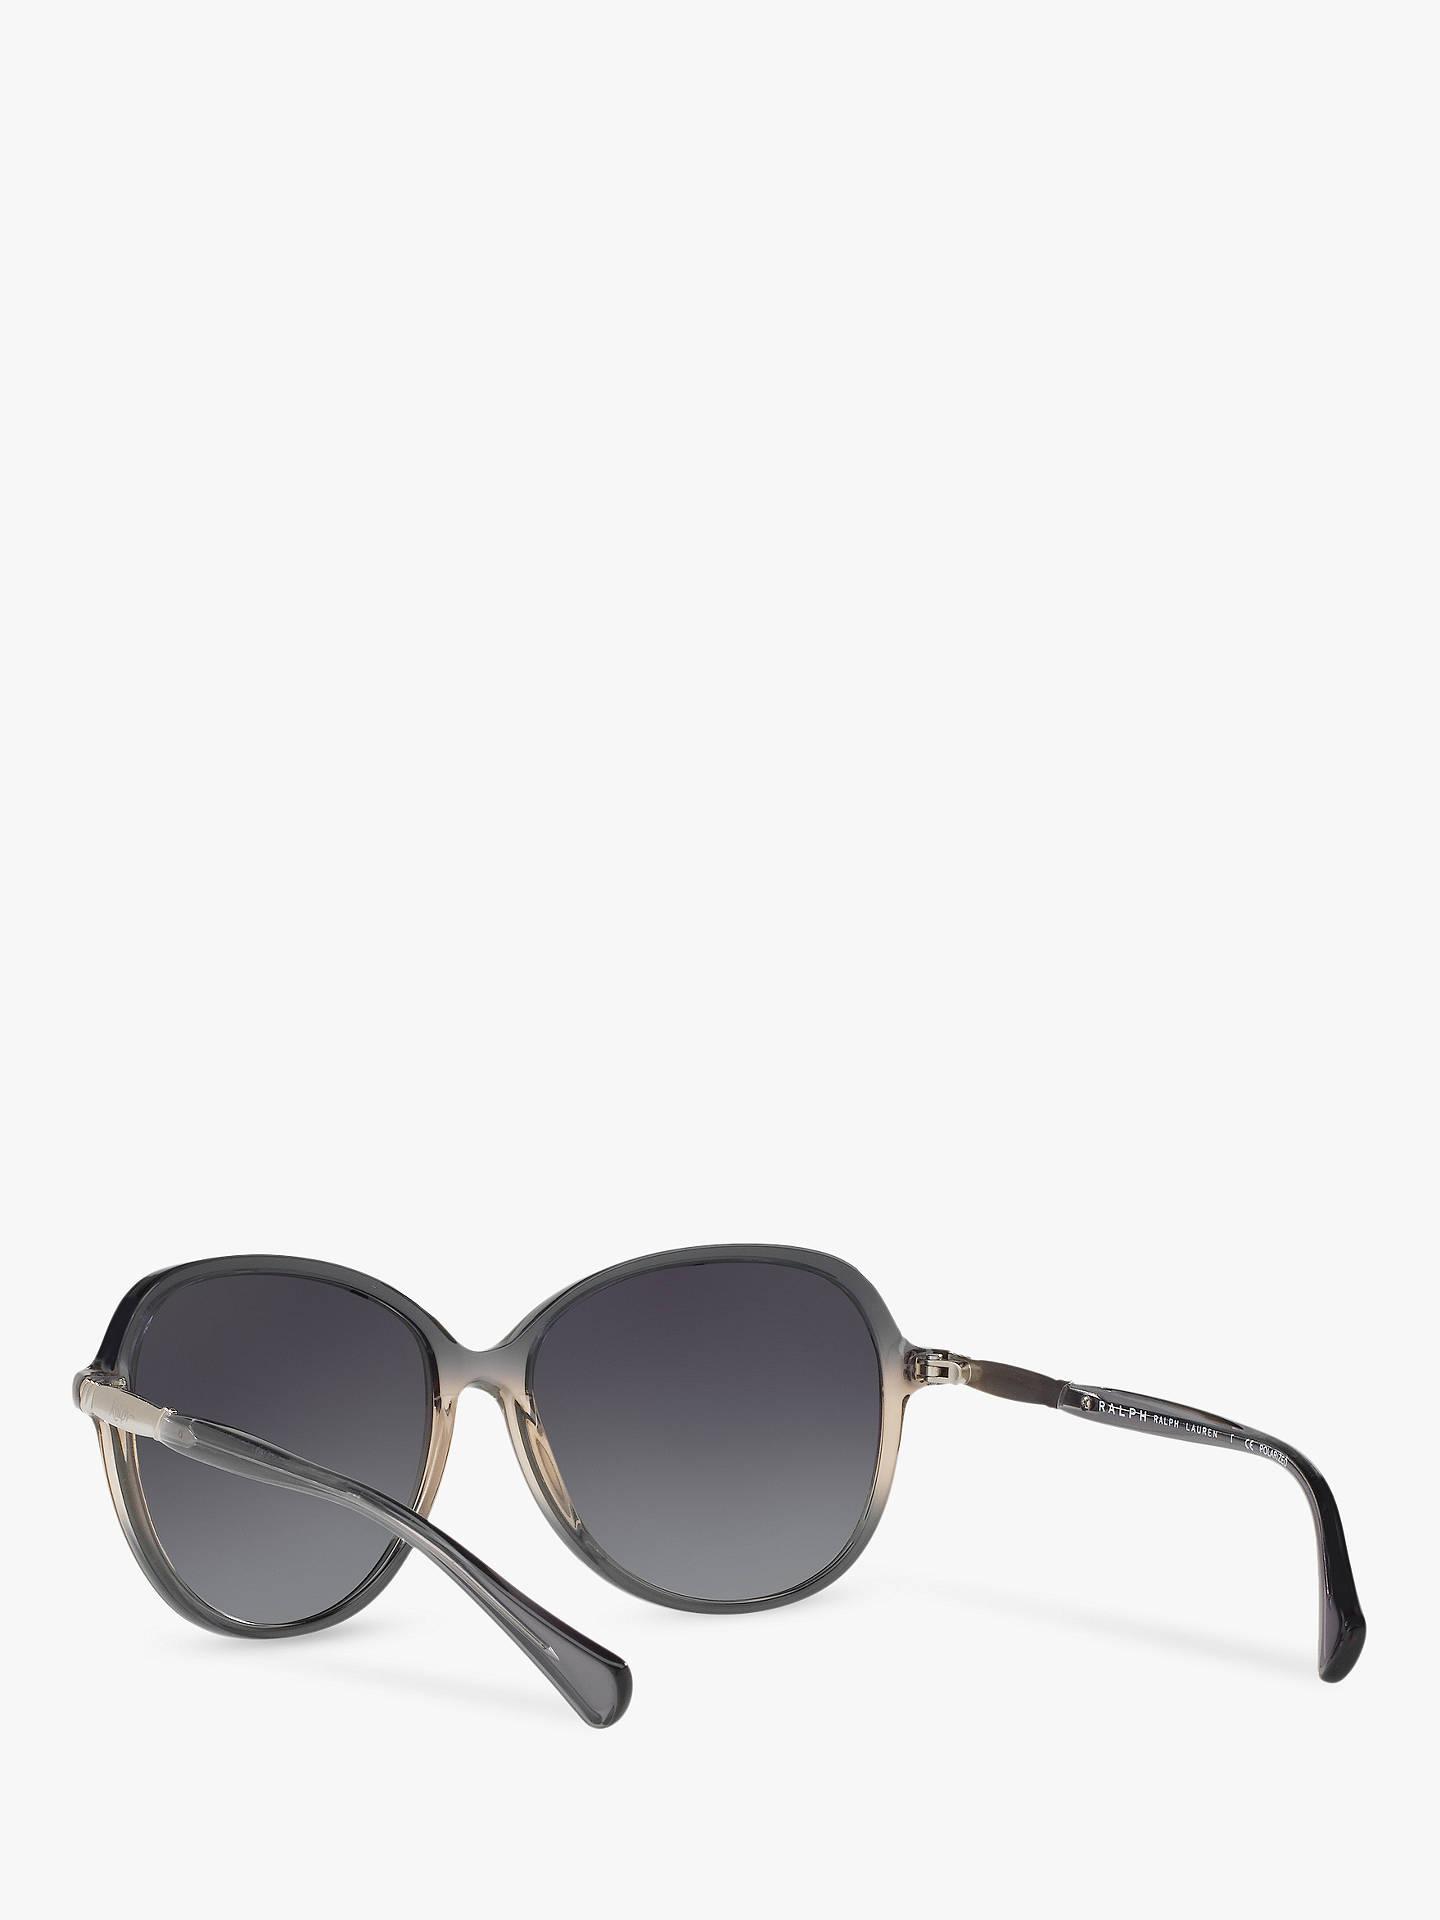 37e75d881b59 ... Buy Ralph RA5220 Women's Polarised Oversize Square Sunglasses,  Smoke/Grey Gradient Online at johnlewis ...